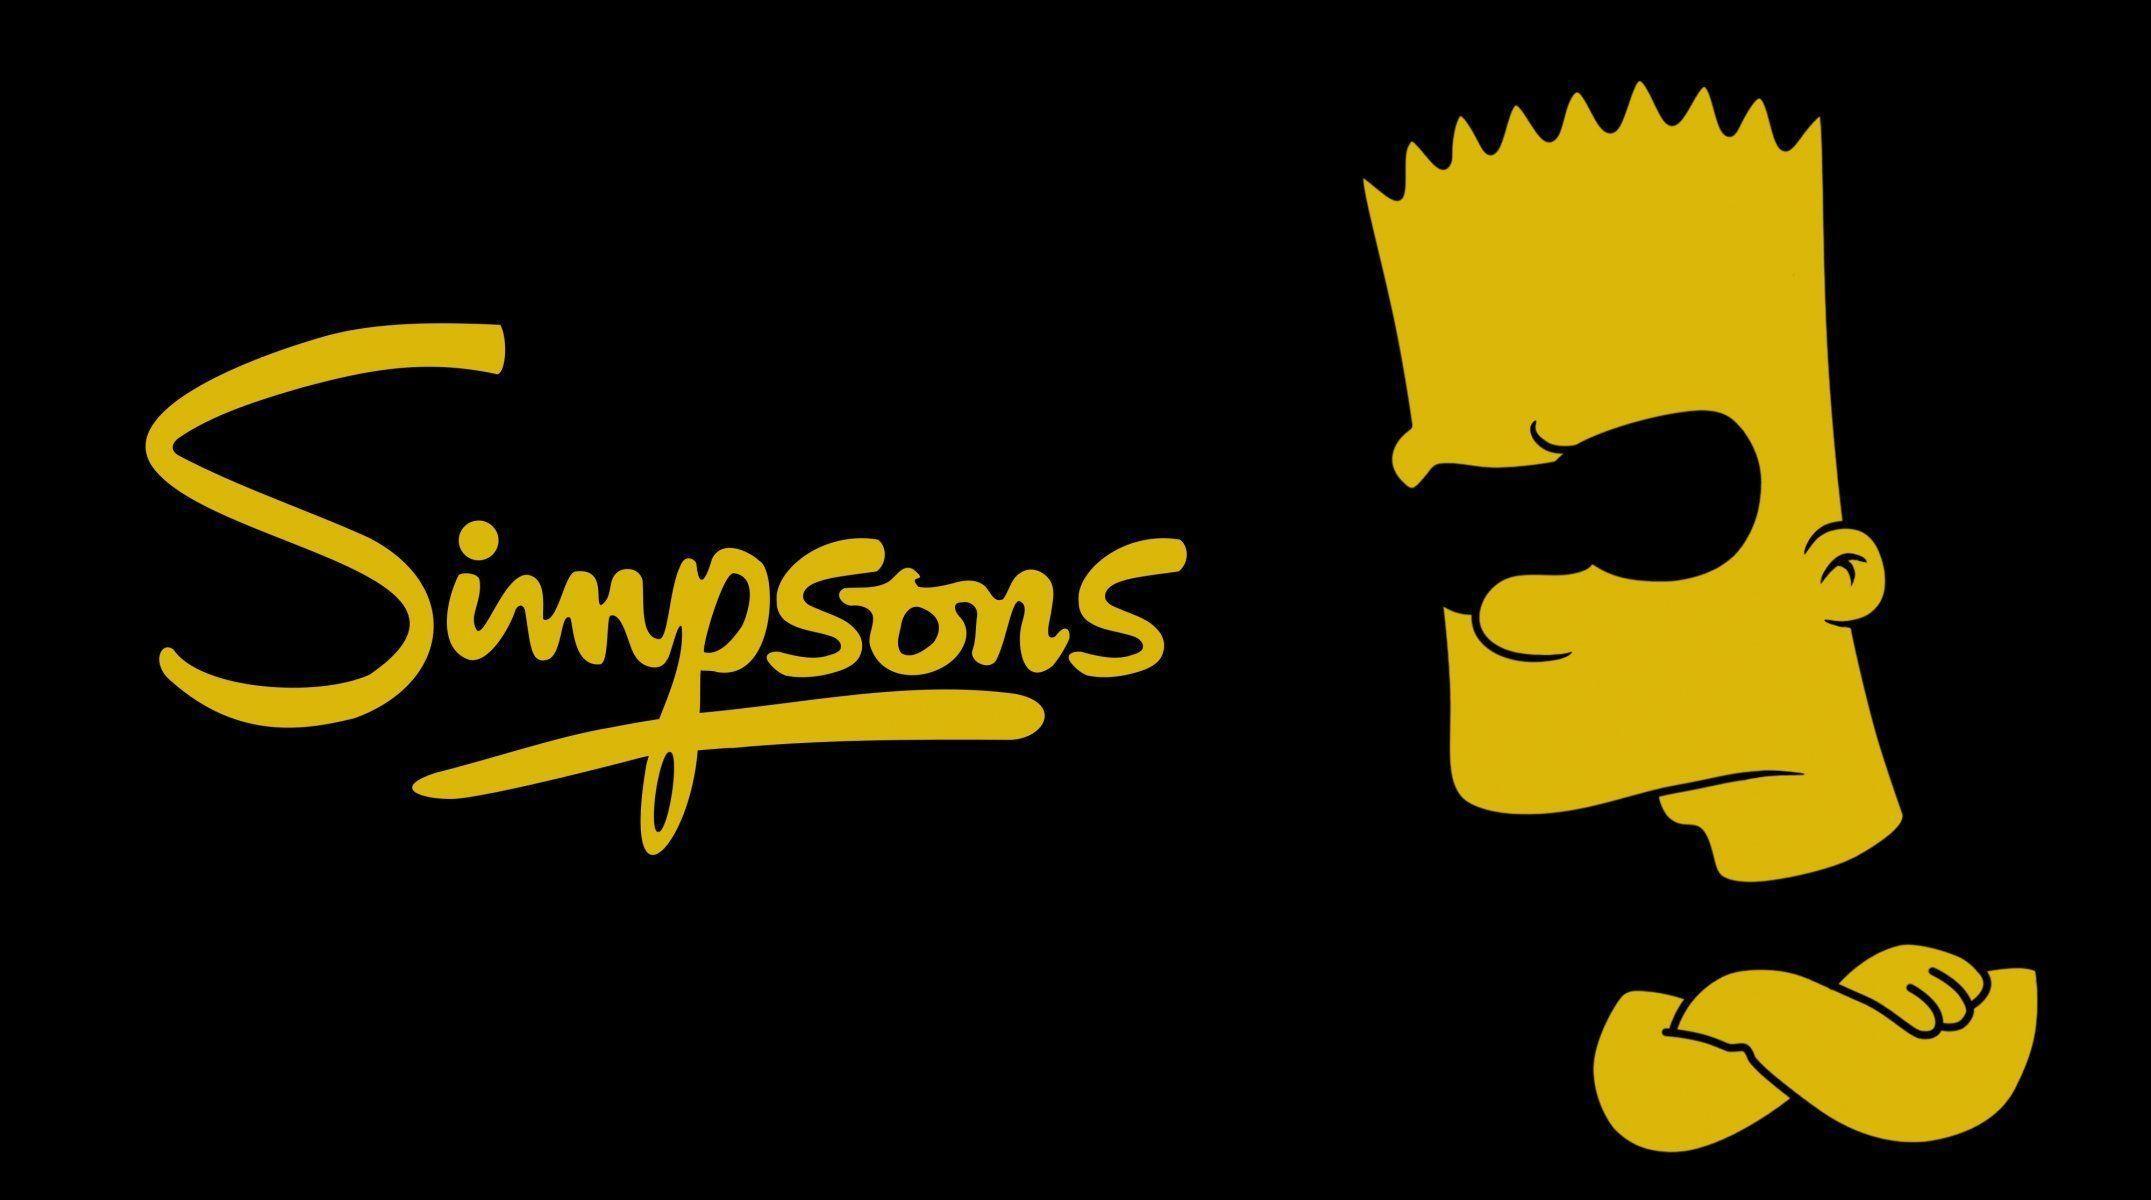 Fondos De Pantalla Supreme: Simpsons Supreme Wallpapers